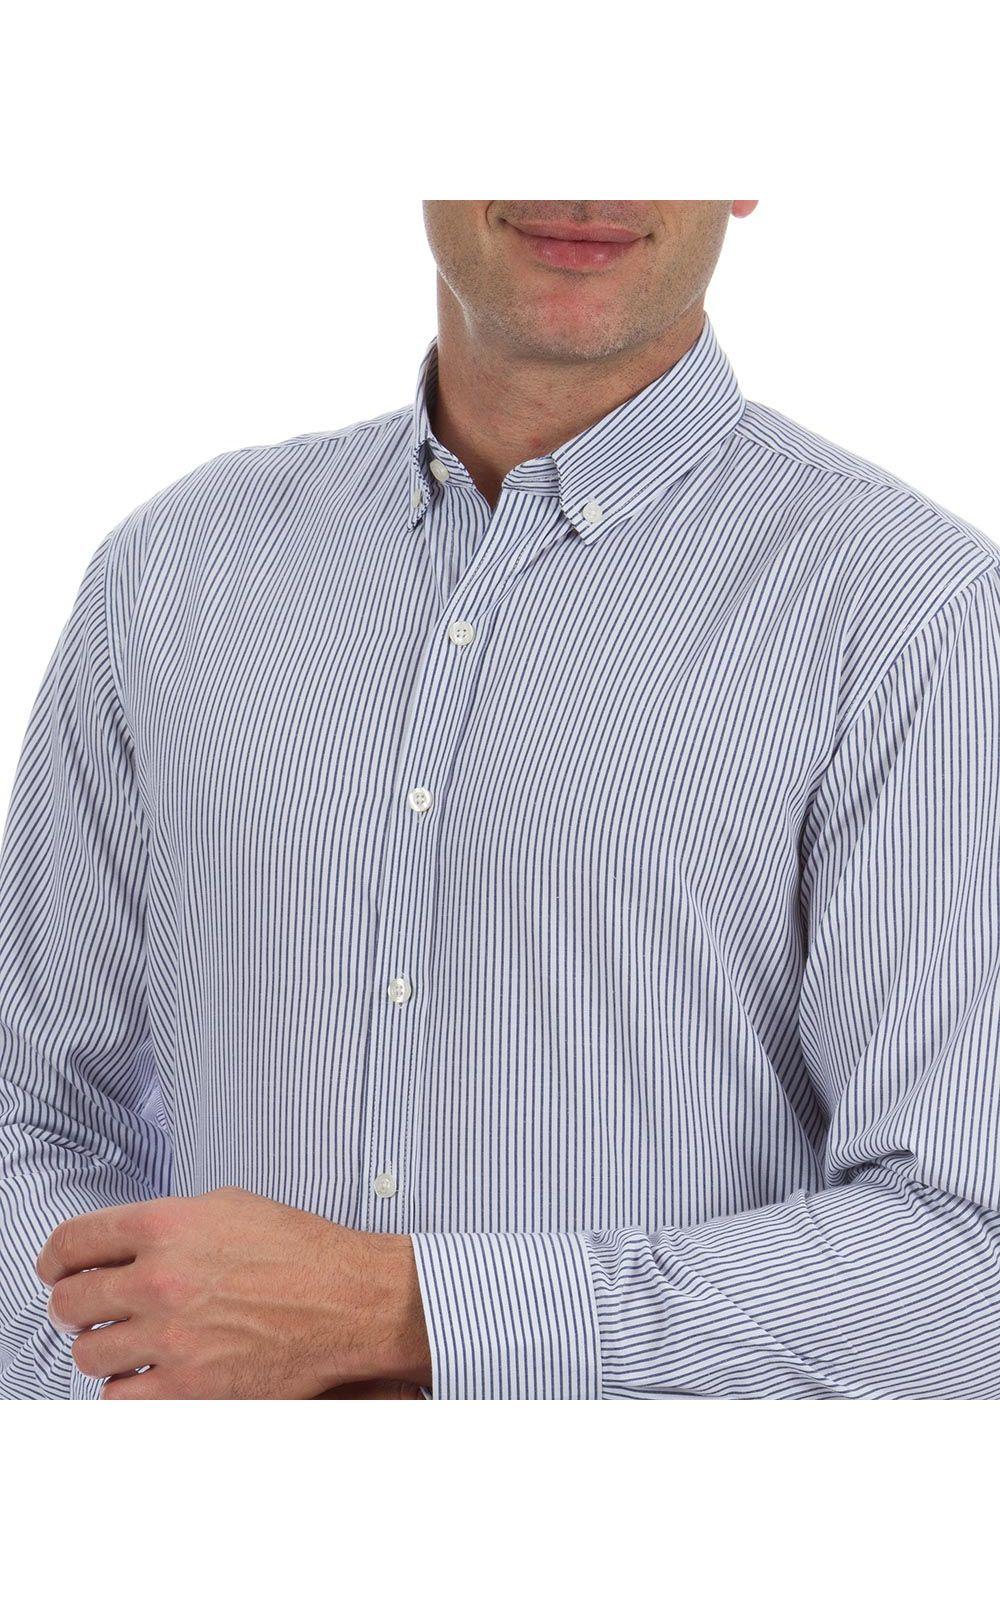 Foto 3 - Camisa Social Masculina Azul Listrada